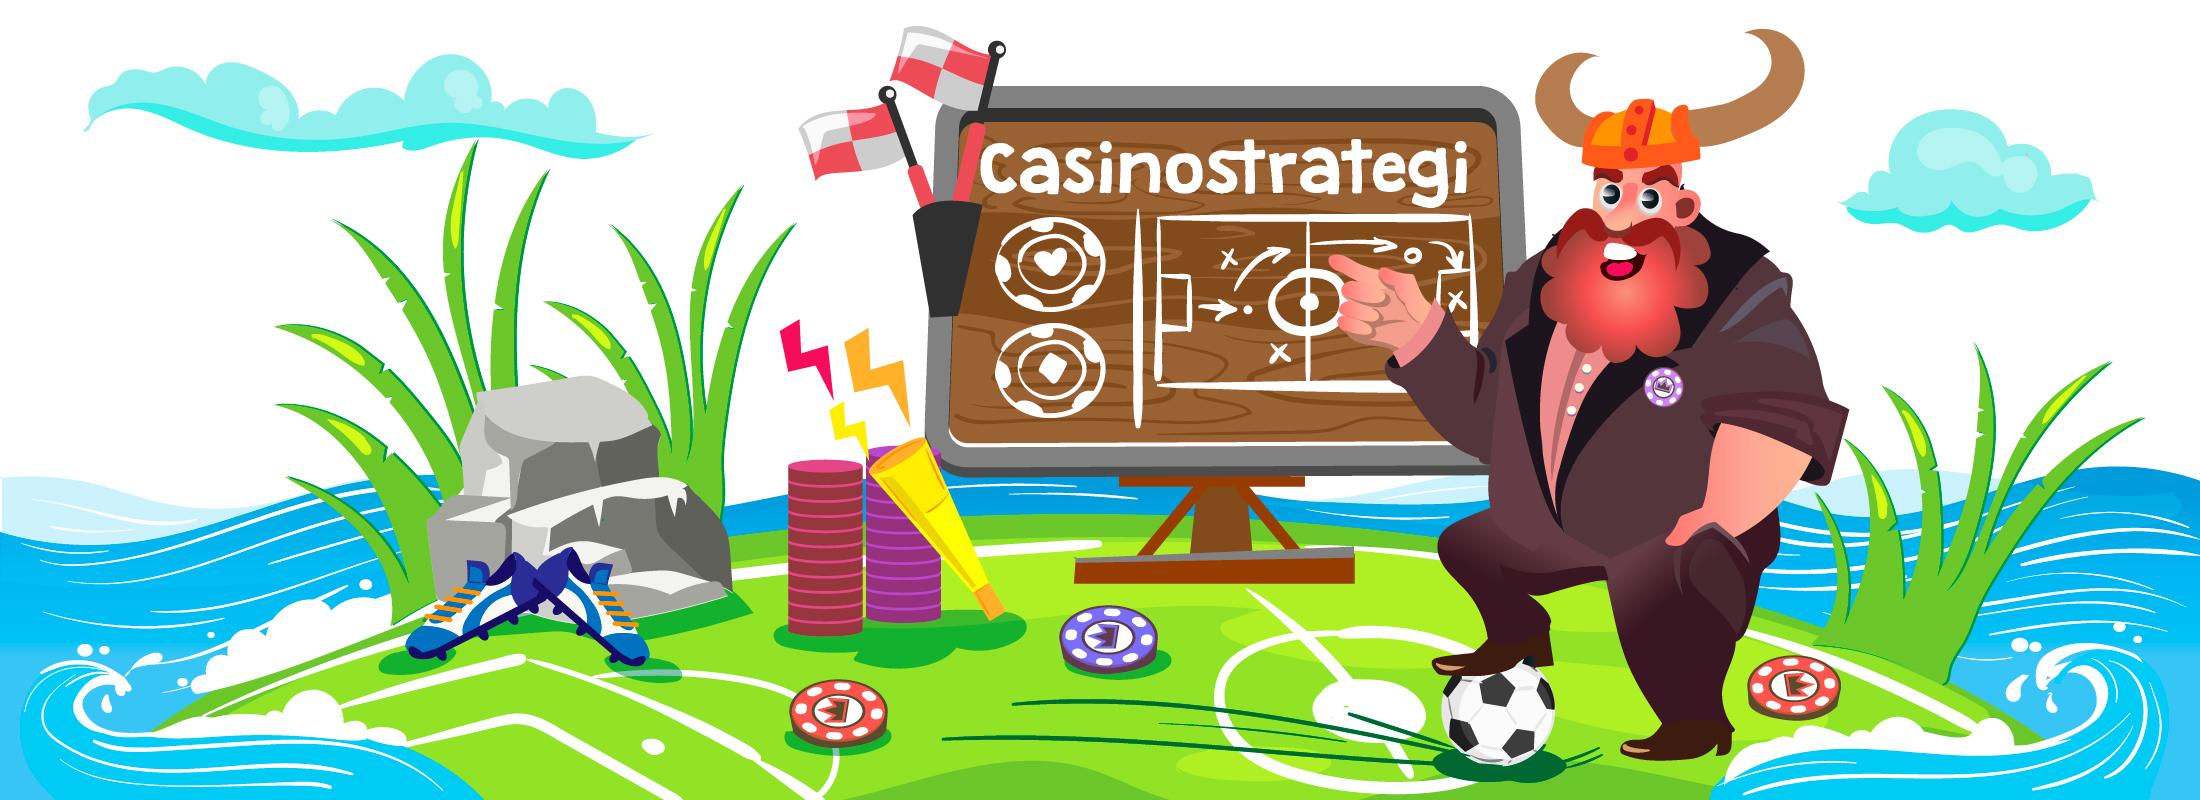 Kurs 2: Casinostrategi